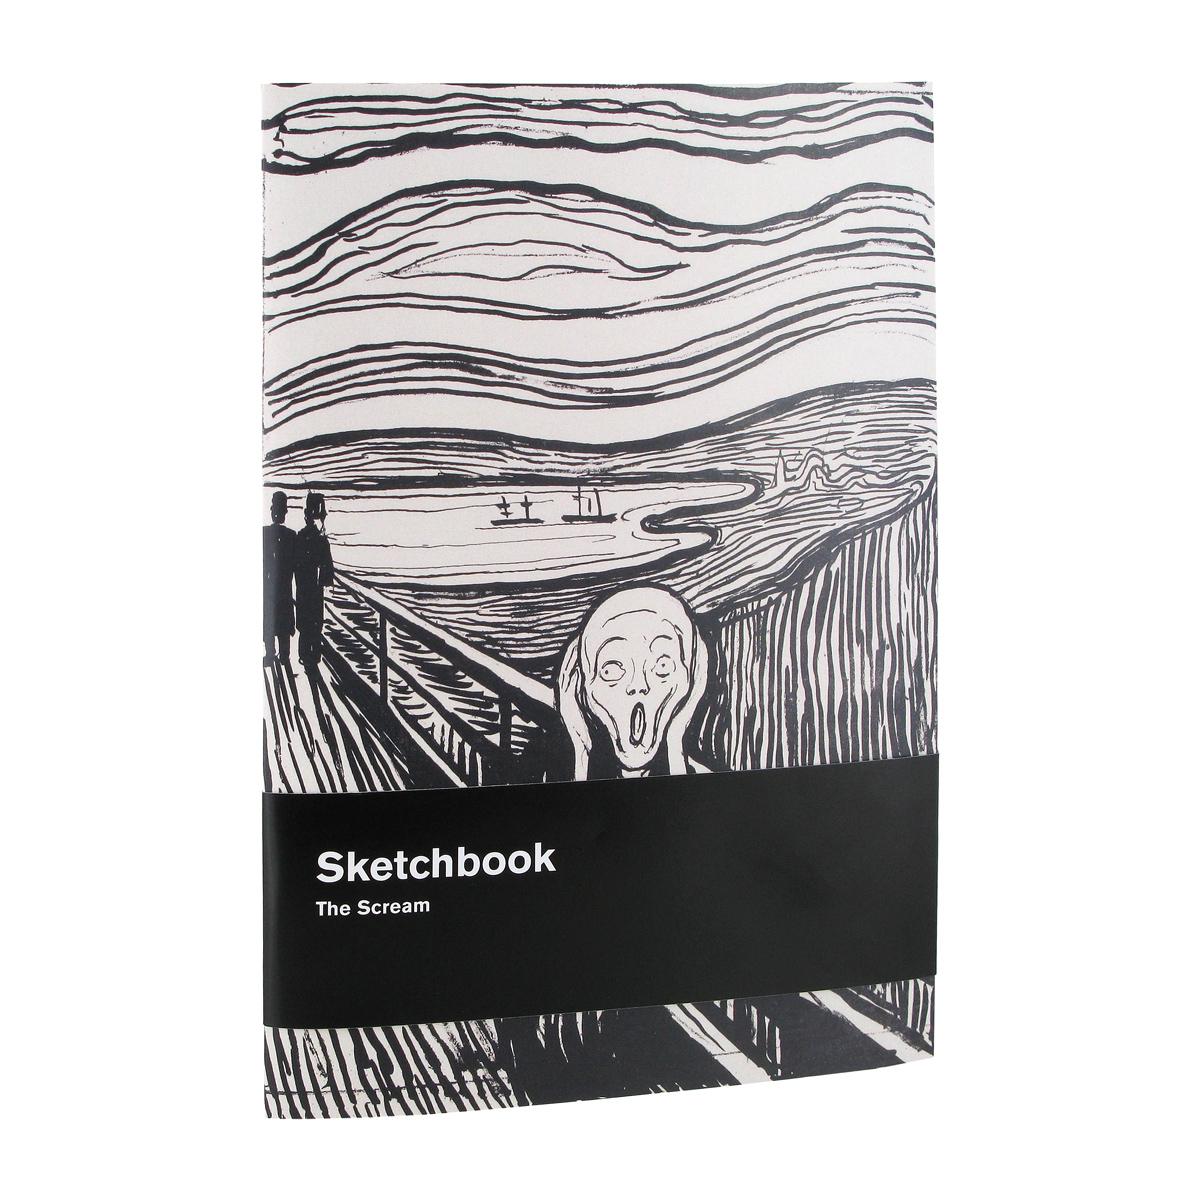 The Scream sketchbook